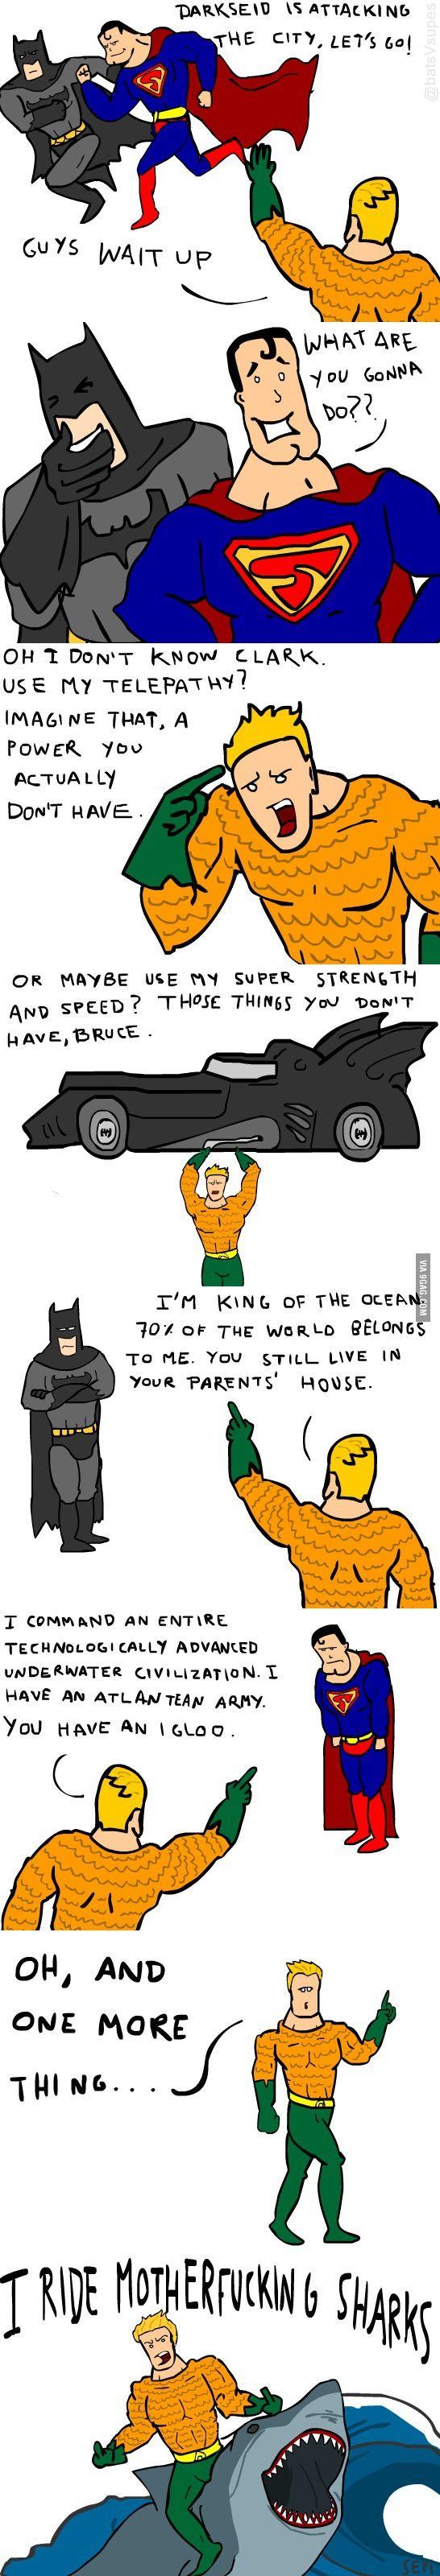 Don't Mess Wth Aquaman! Even Batman Can't Beat Him! <<<< uhh batman can beat anyone